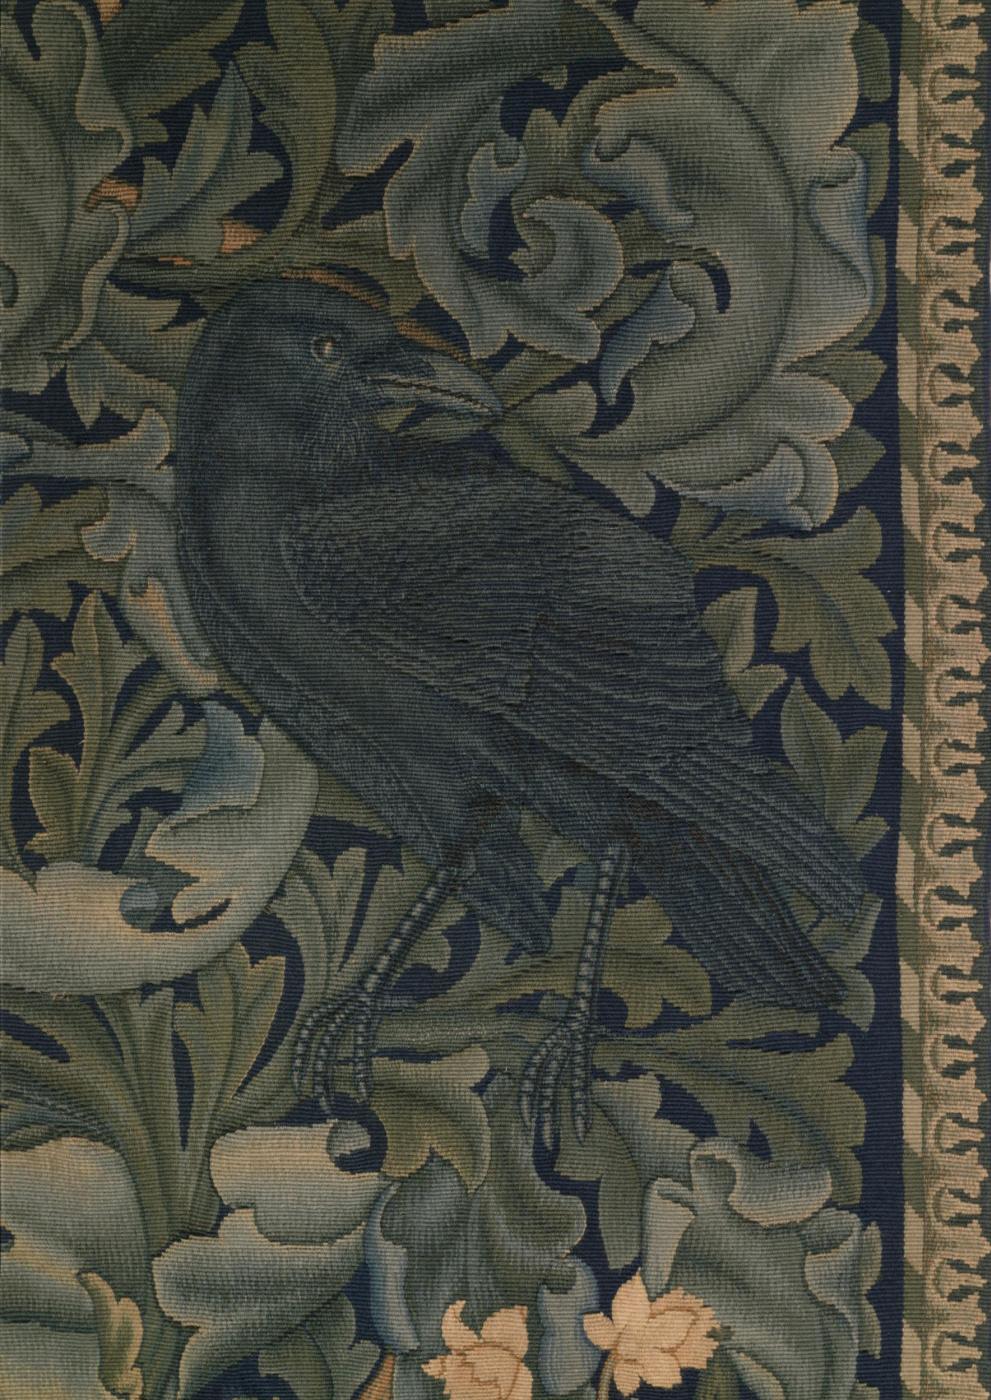 William Morris. Forest. Fragment. Raven